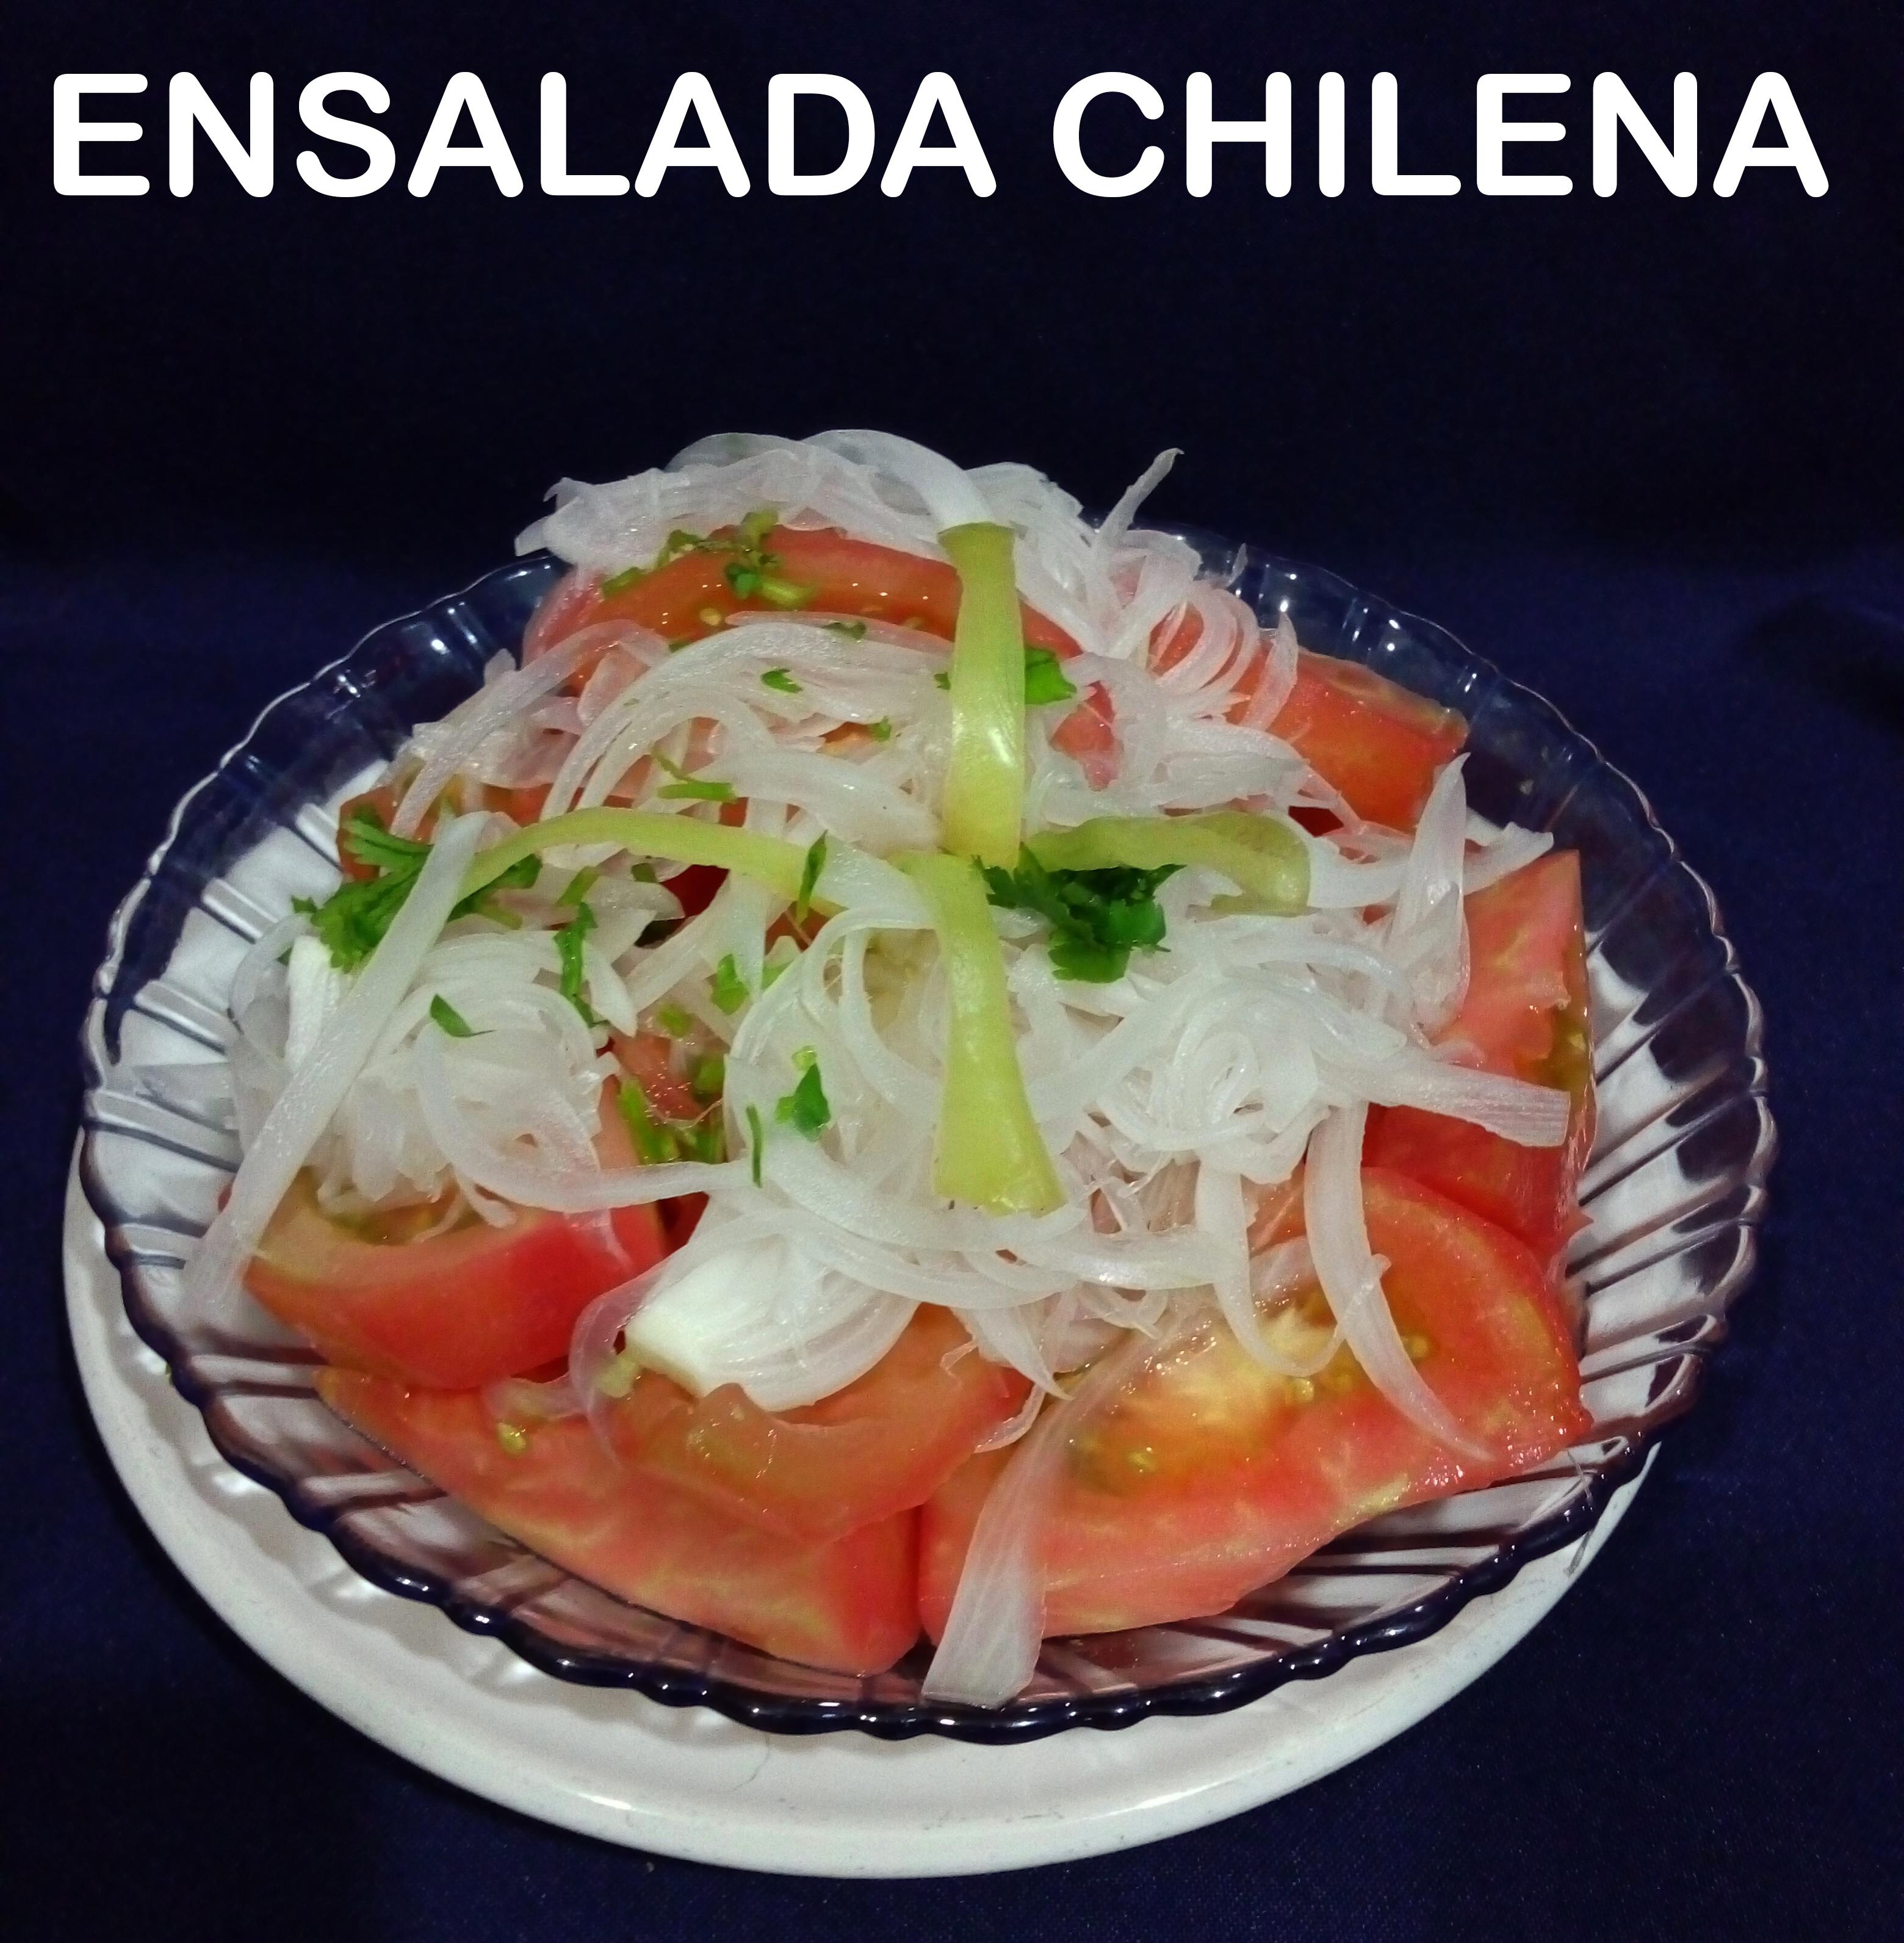 https://0201.nccdn.net/1_2/000/000/0b3/7be/ensalada-chilena-3120x3184.jpg